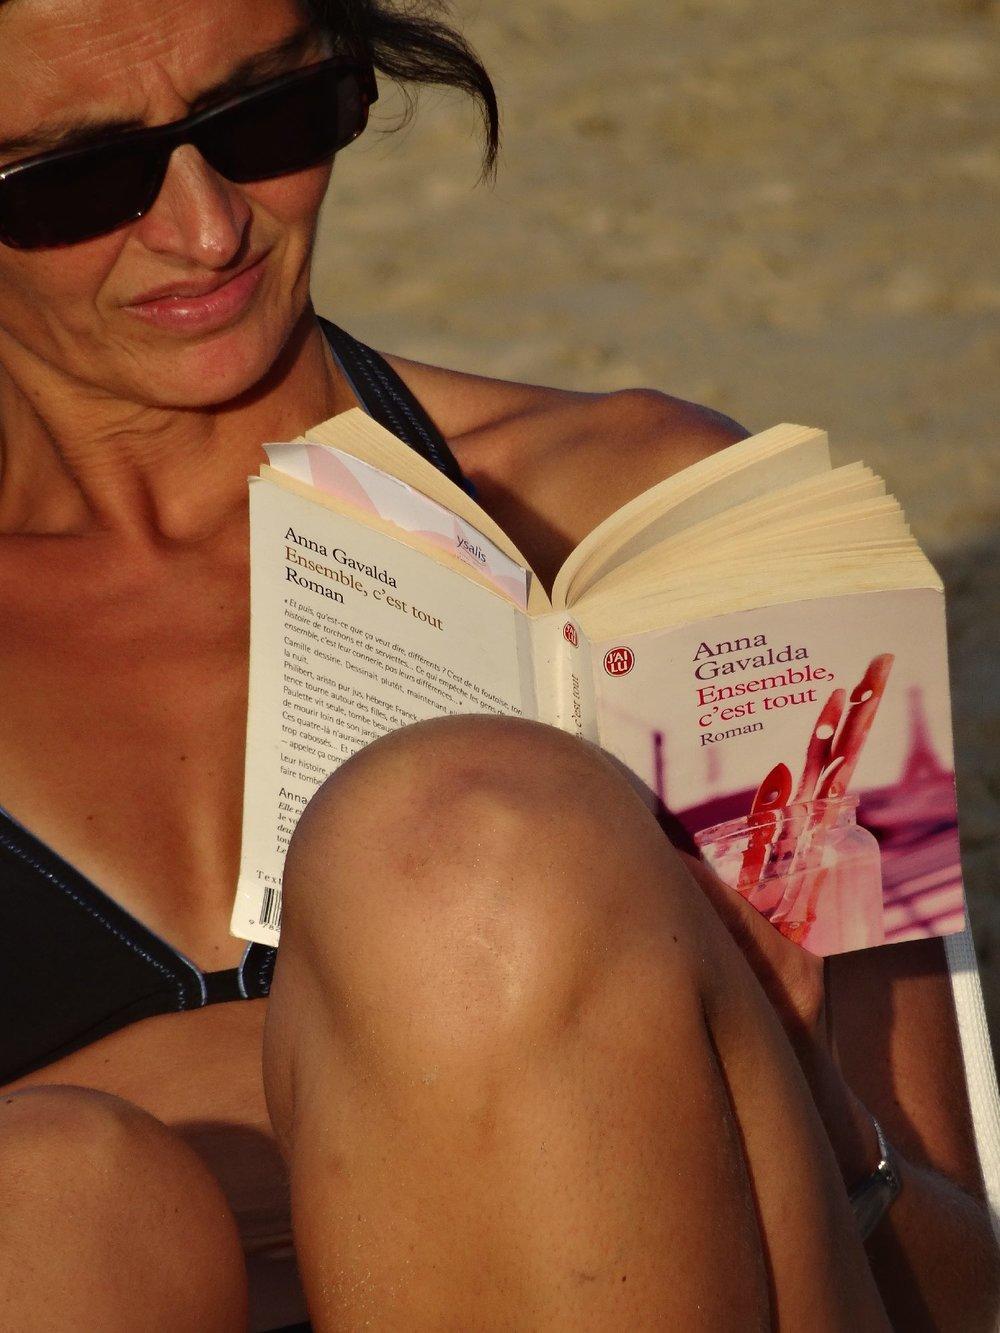 Woman reading on the beach | Anna Gavalda | Ensemble c'est tout | photo sandrine cohen